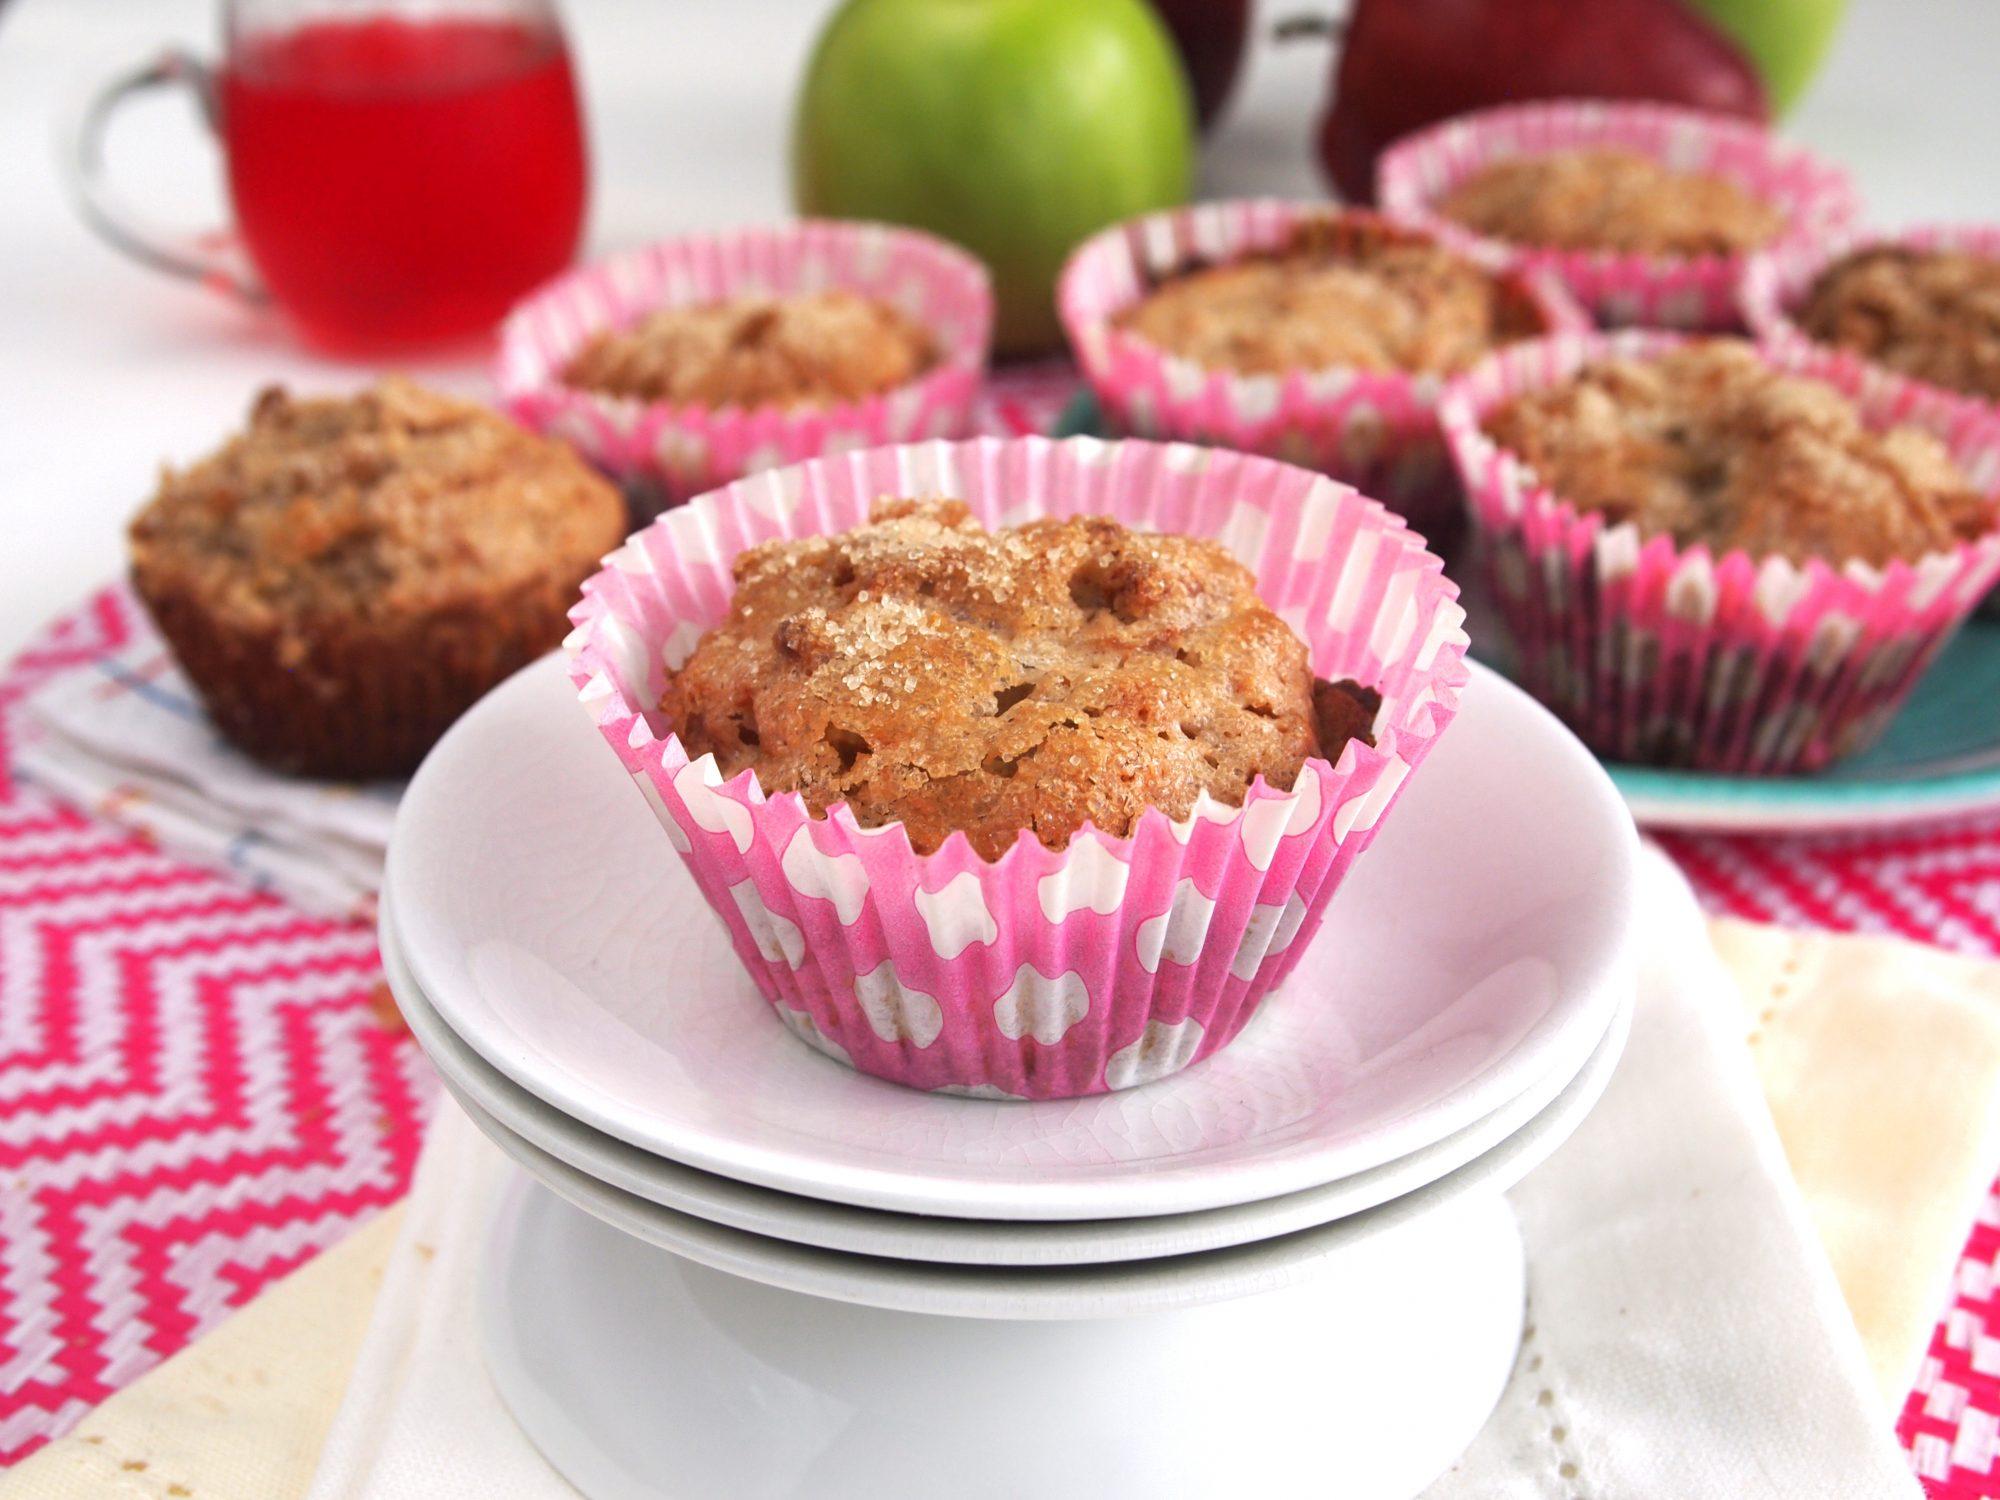 Cheerios™ - Apple and Cheerios™ Banana Muffins